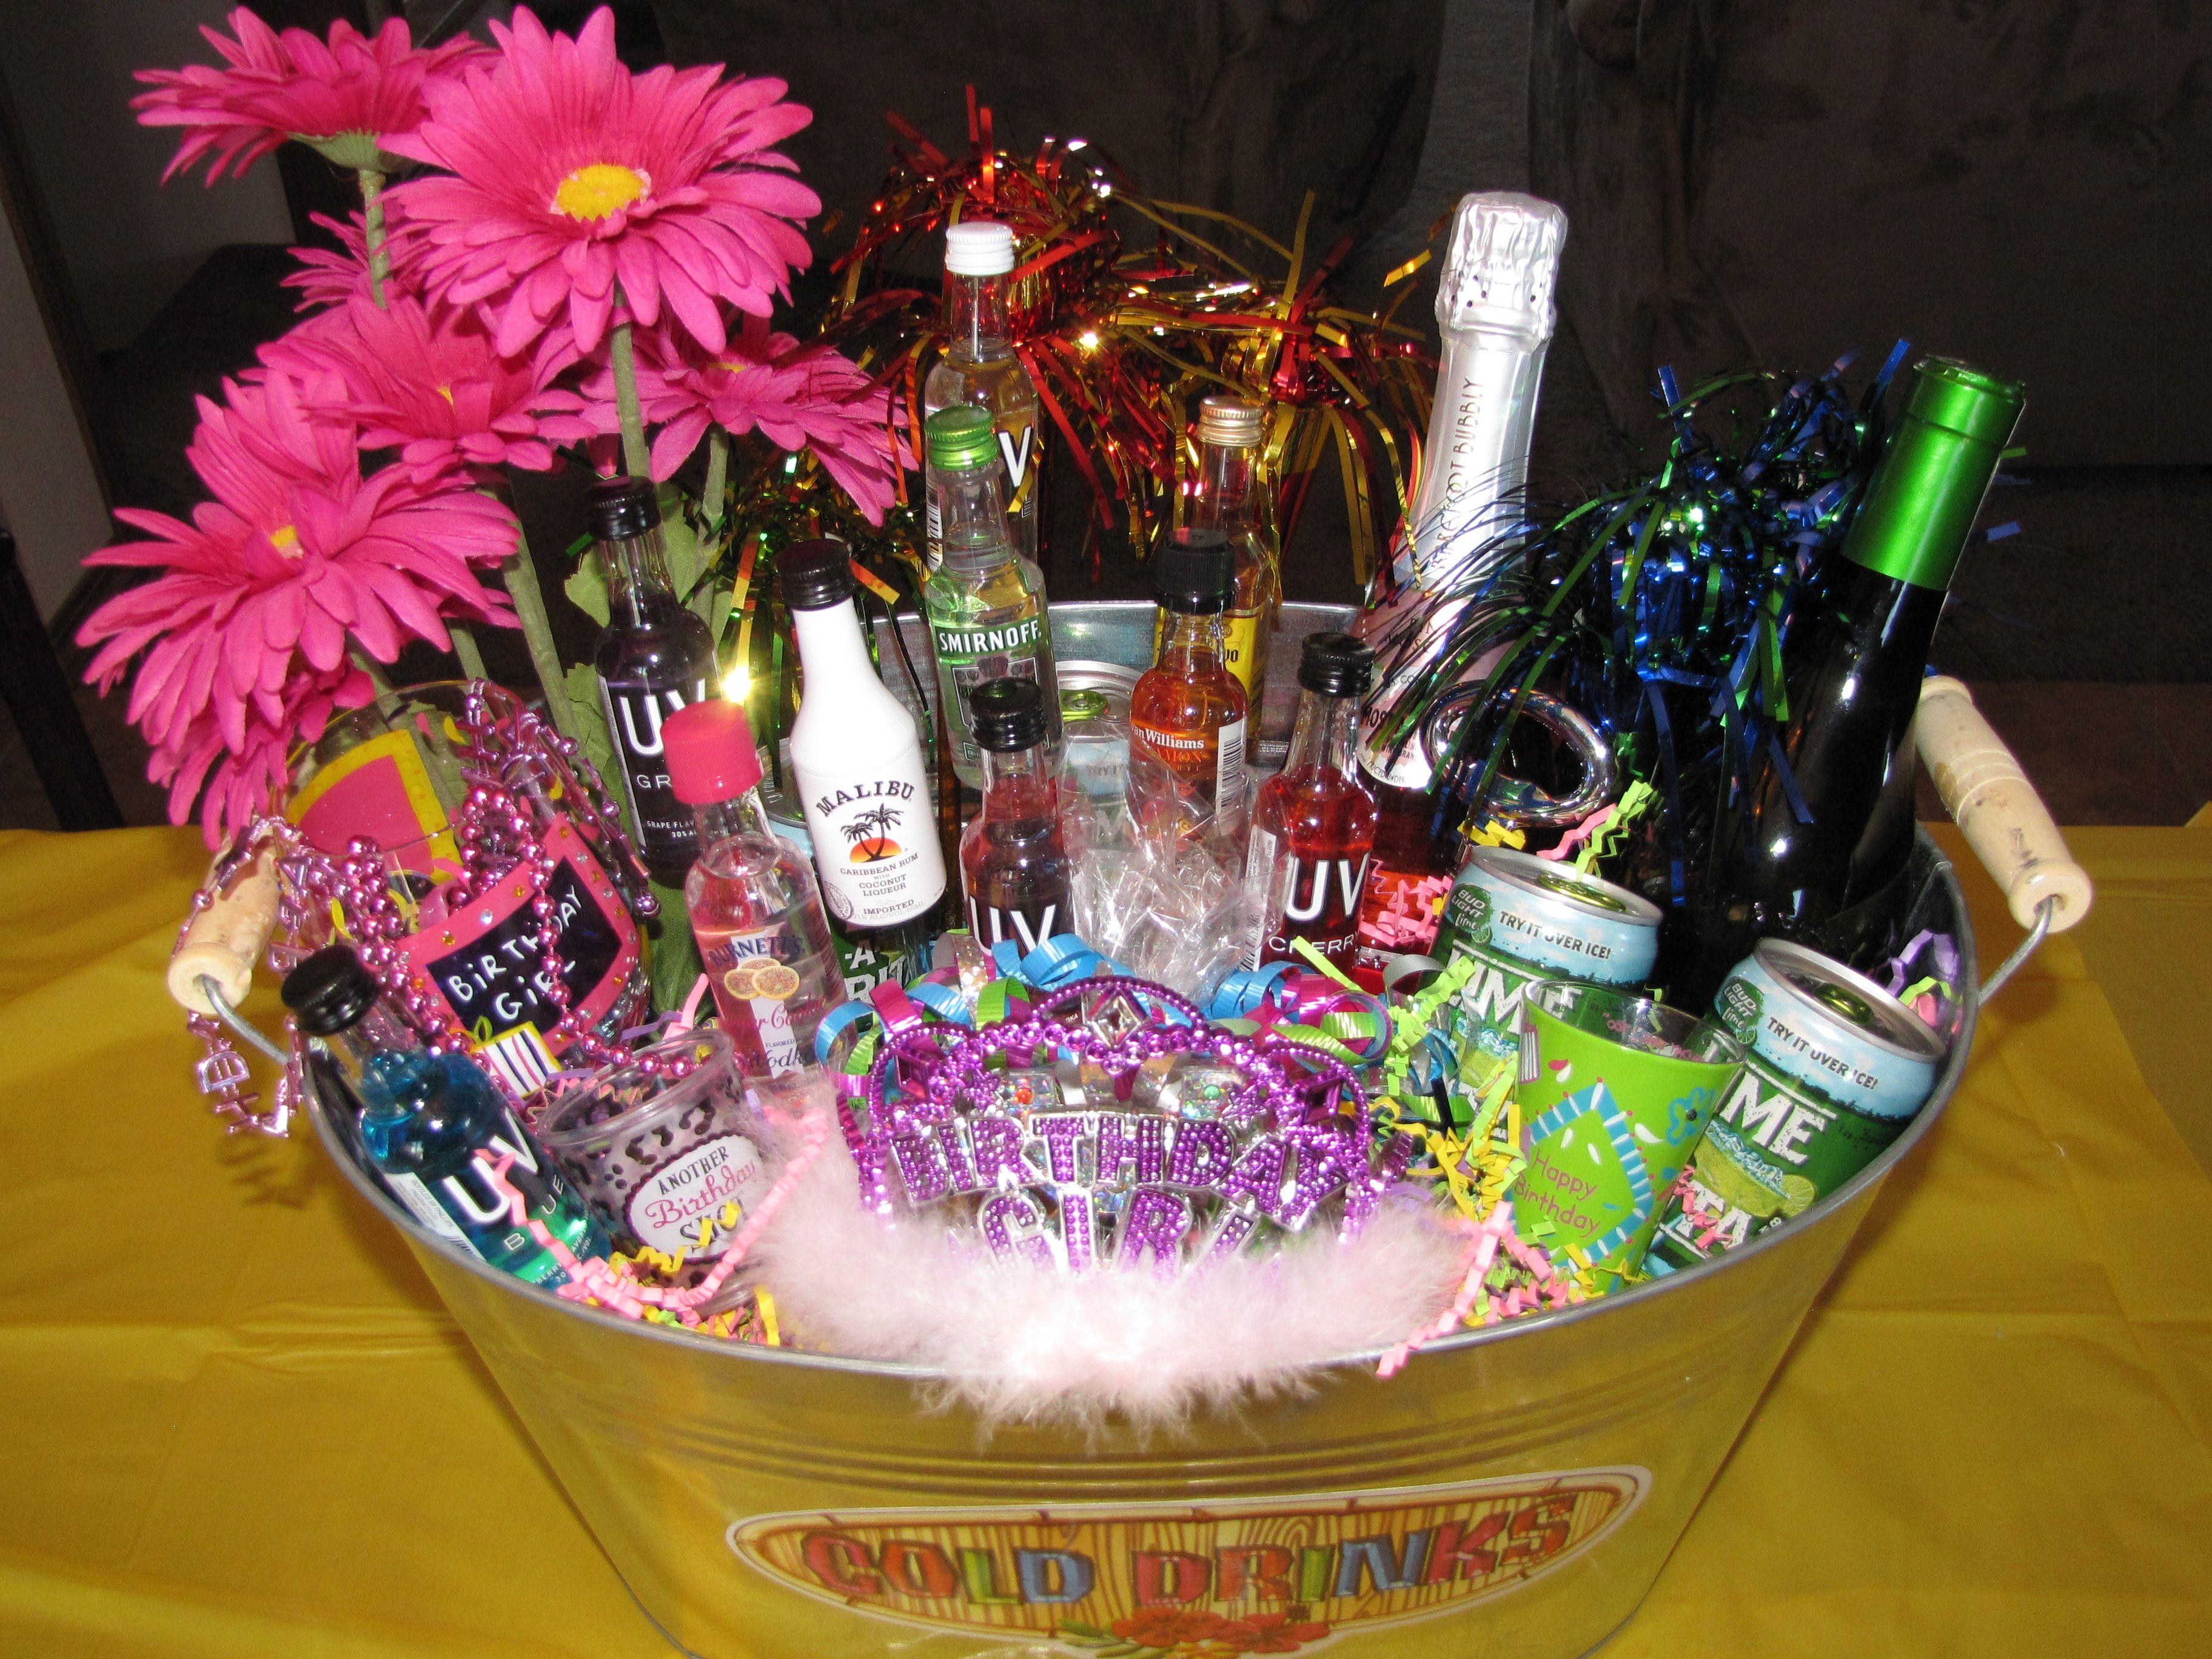 21st birthday bucket gifts